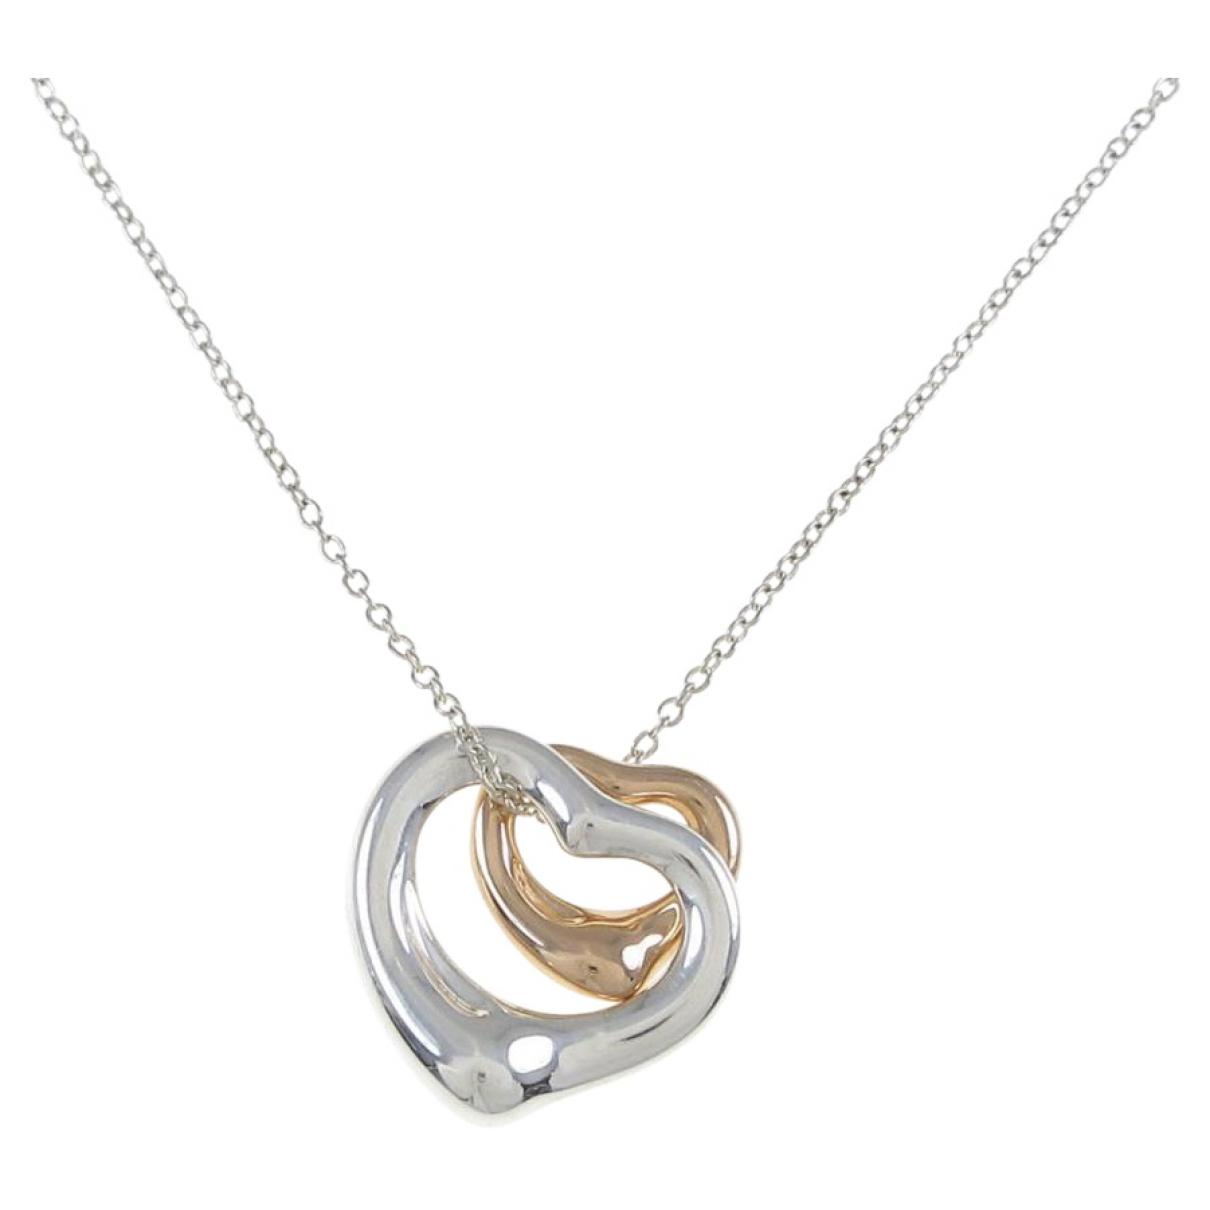 Tiffany & Co Elsa Peretti  Kette in  Silber Rosegold